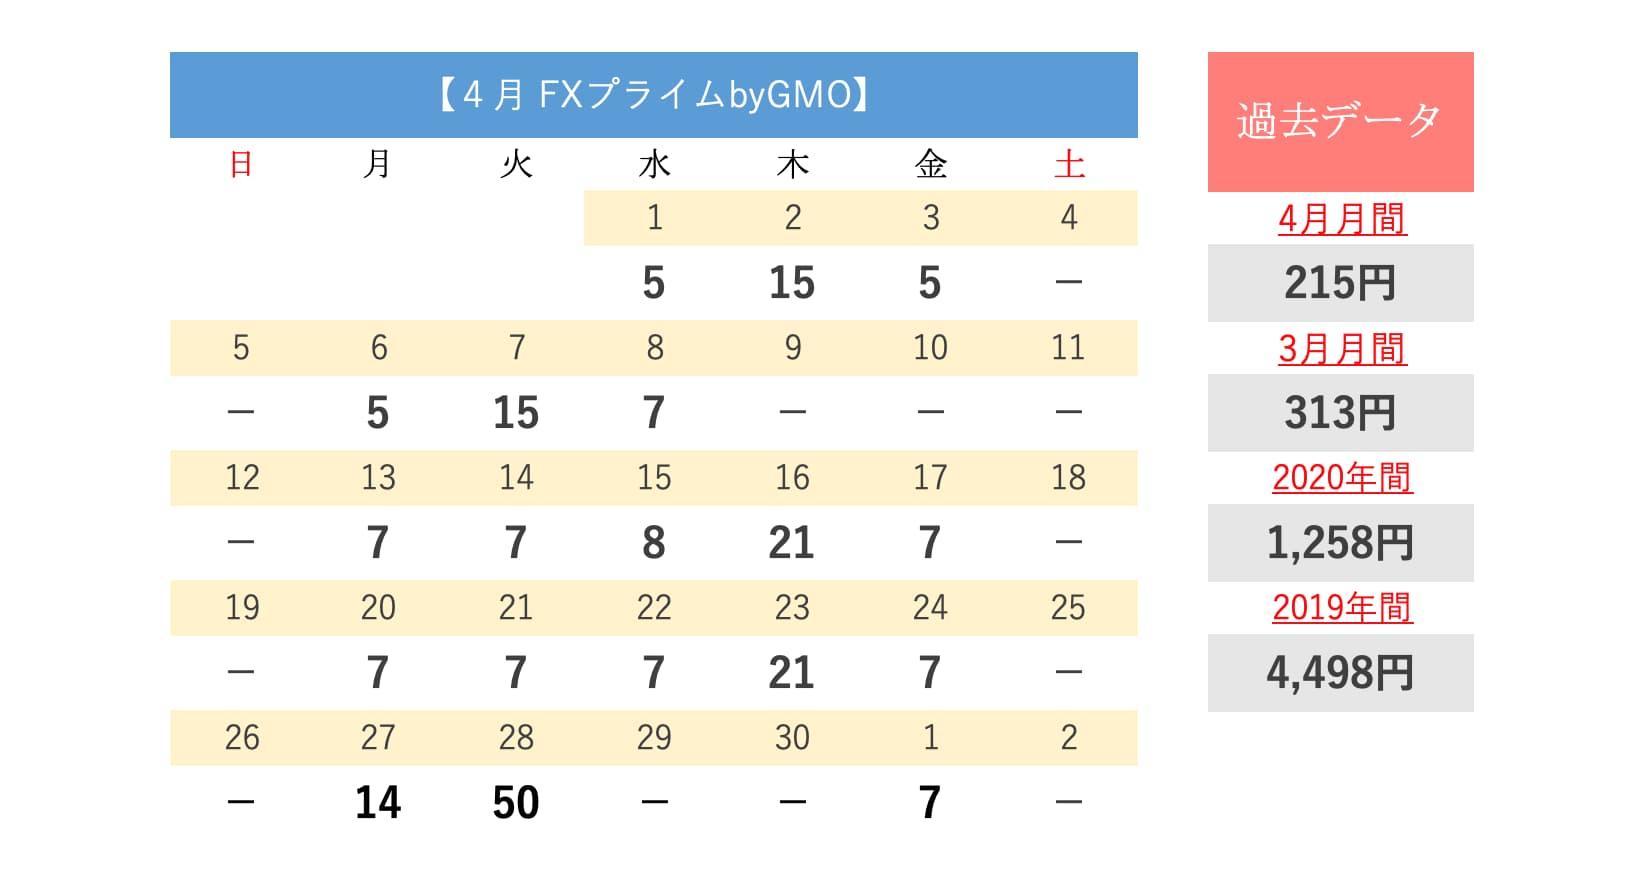 FXプライムbyGMO swap(4月)